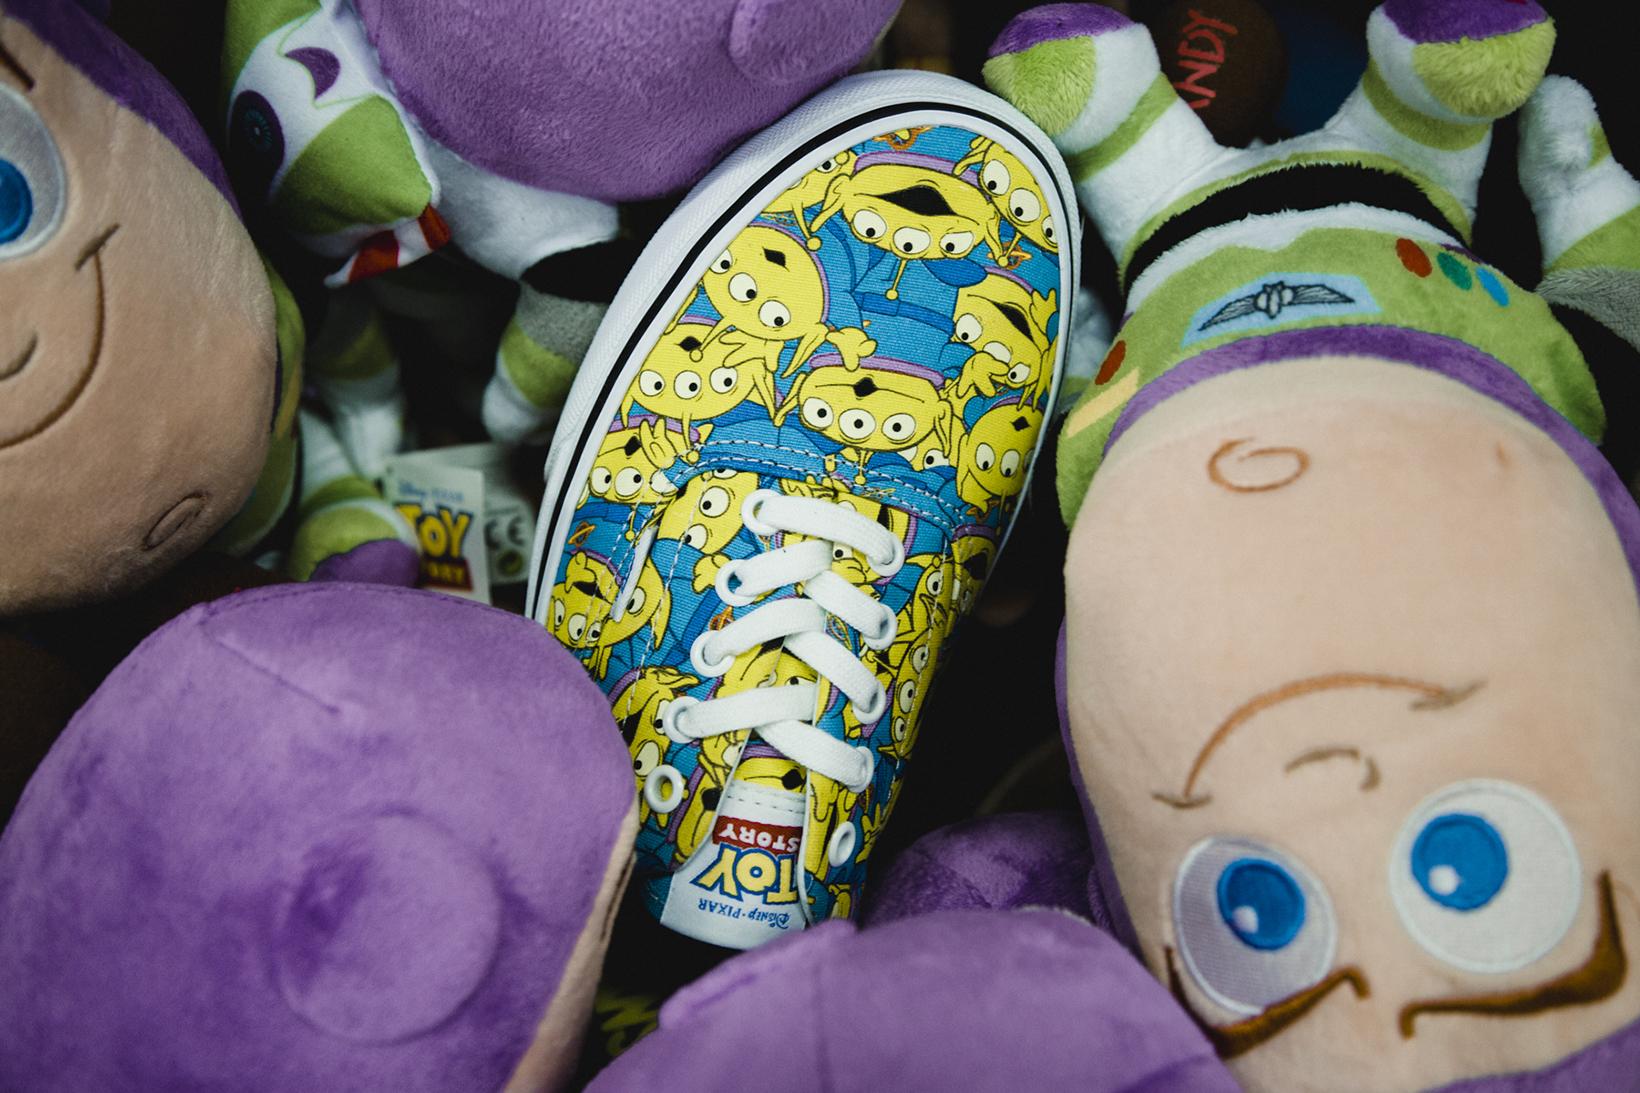 Toy Story Vans Sneakers Woody Buzz Lightyear Disney - 1765028